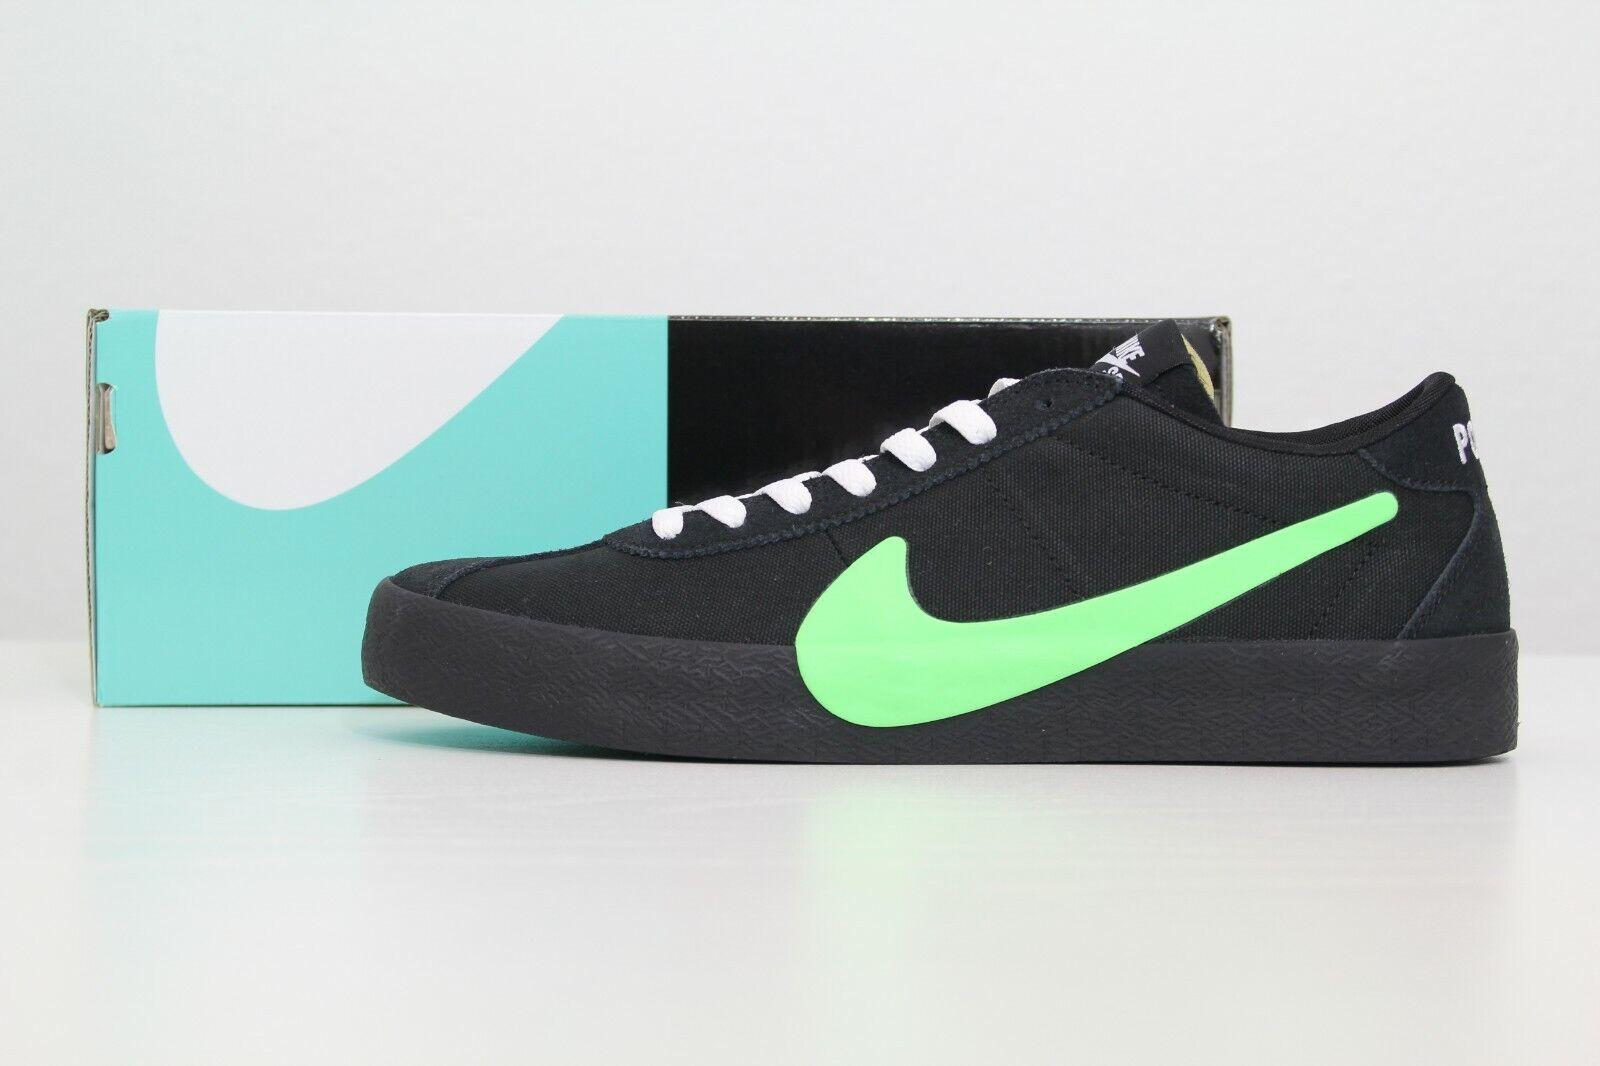 Nike SB Bruin x The Poets US 7 8 8,5 9 9,5 10 10,5 11 11,5 12